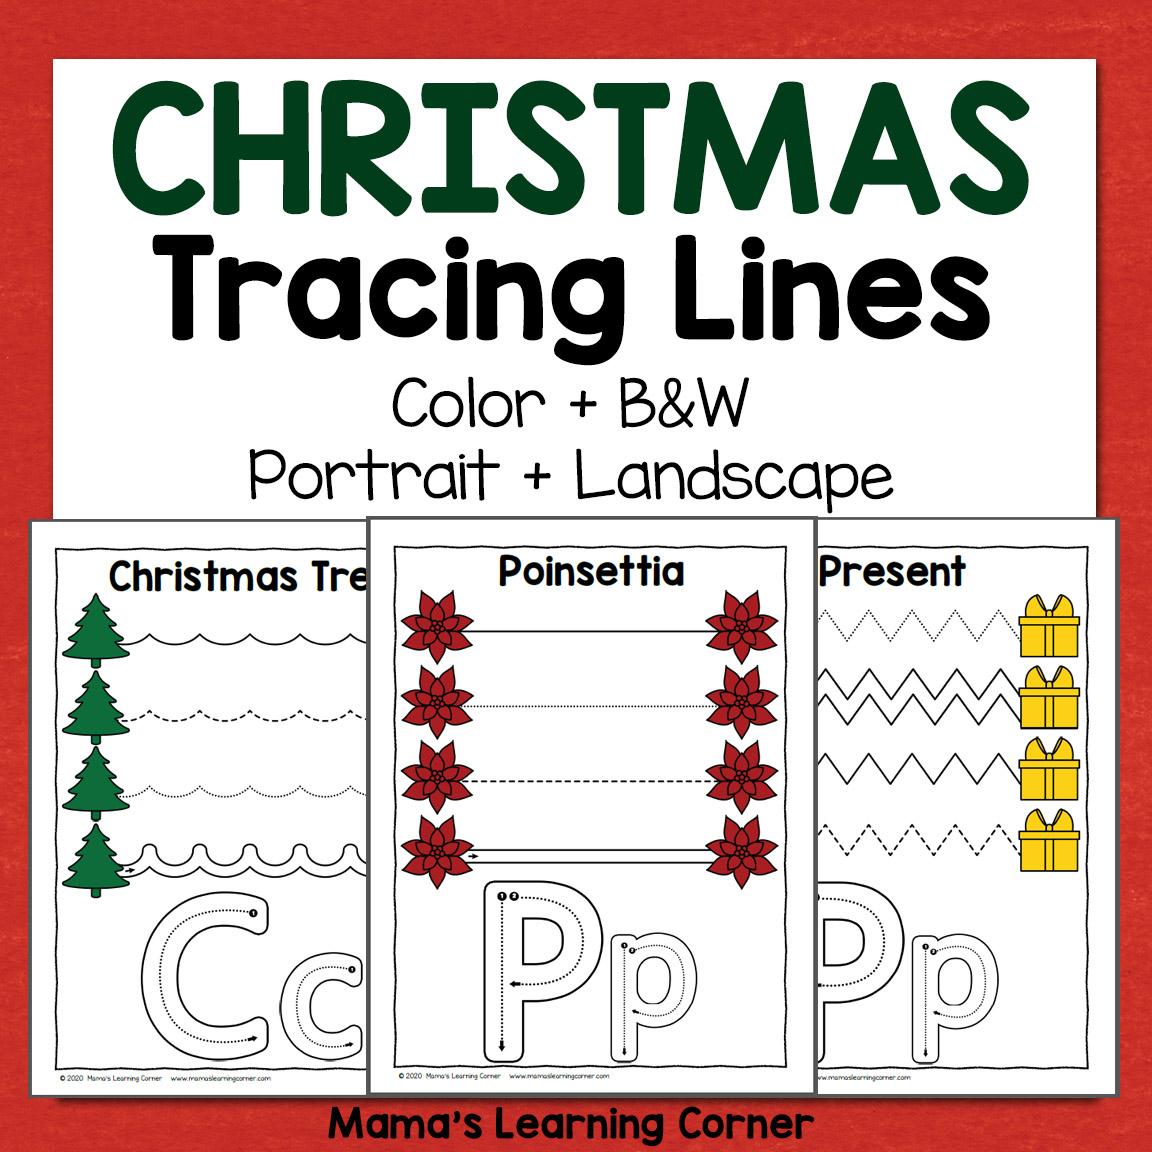 Christmas Tracing Worksheets For Preschool